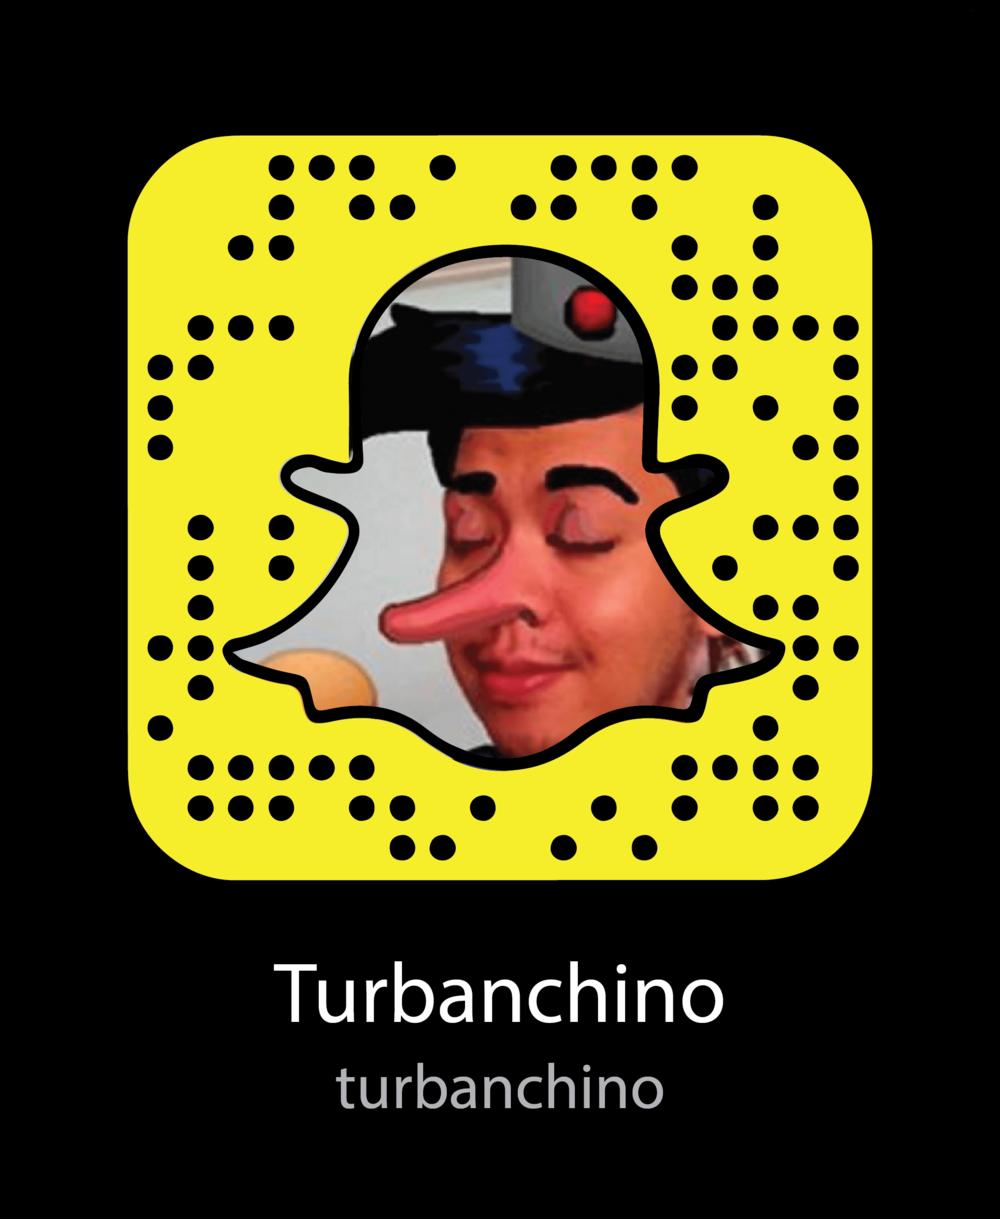 turbanchino-artists-snapchat-snapcode